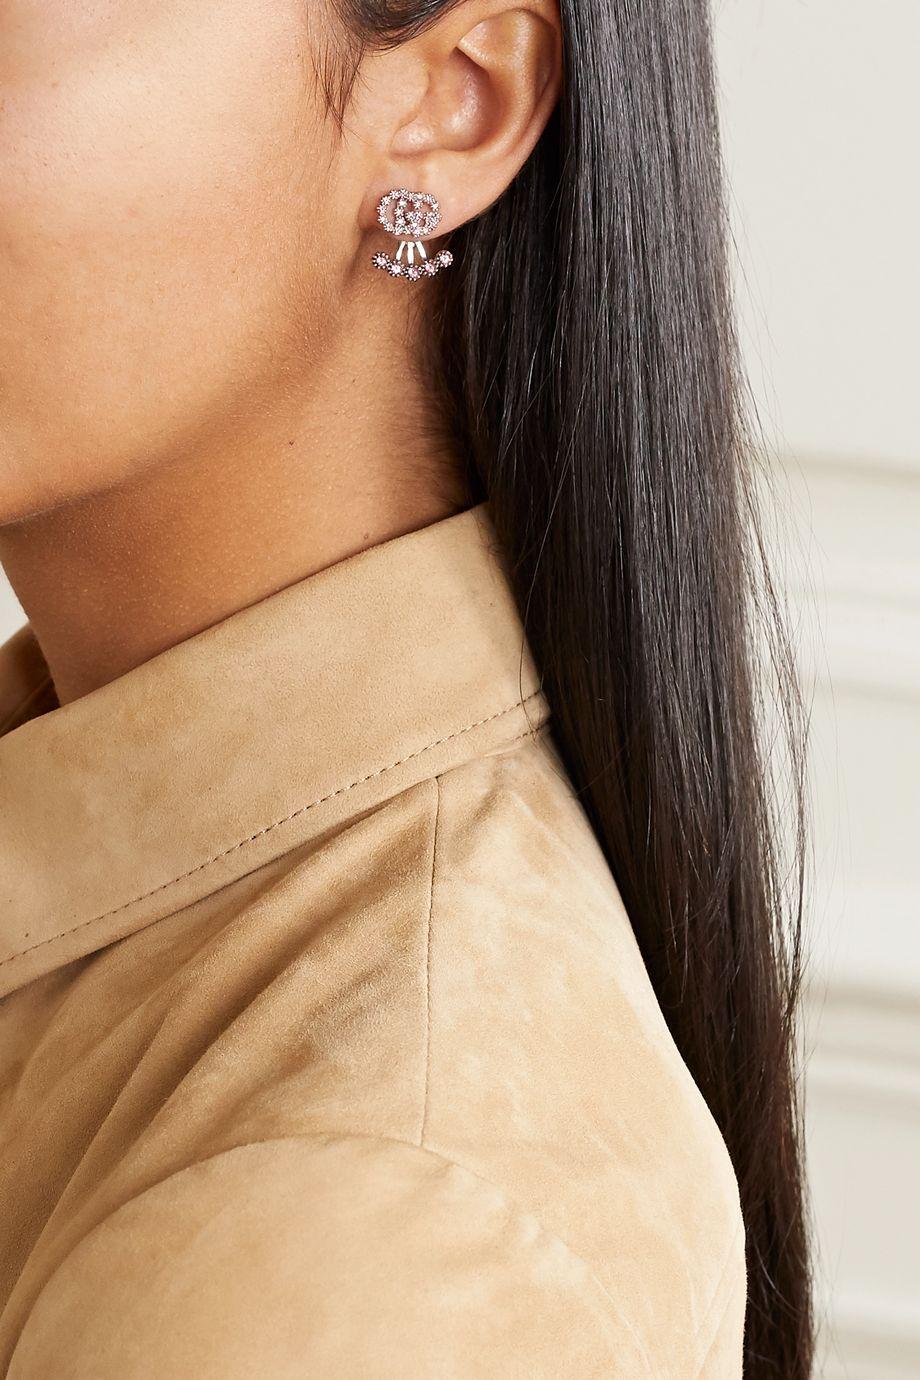 Gucci 18-karat white gold topaz earring